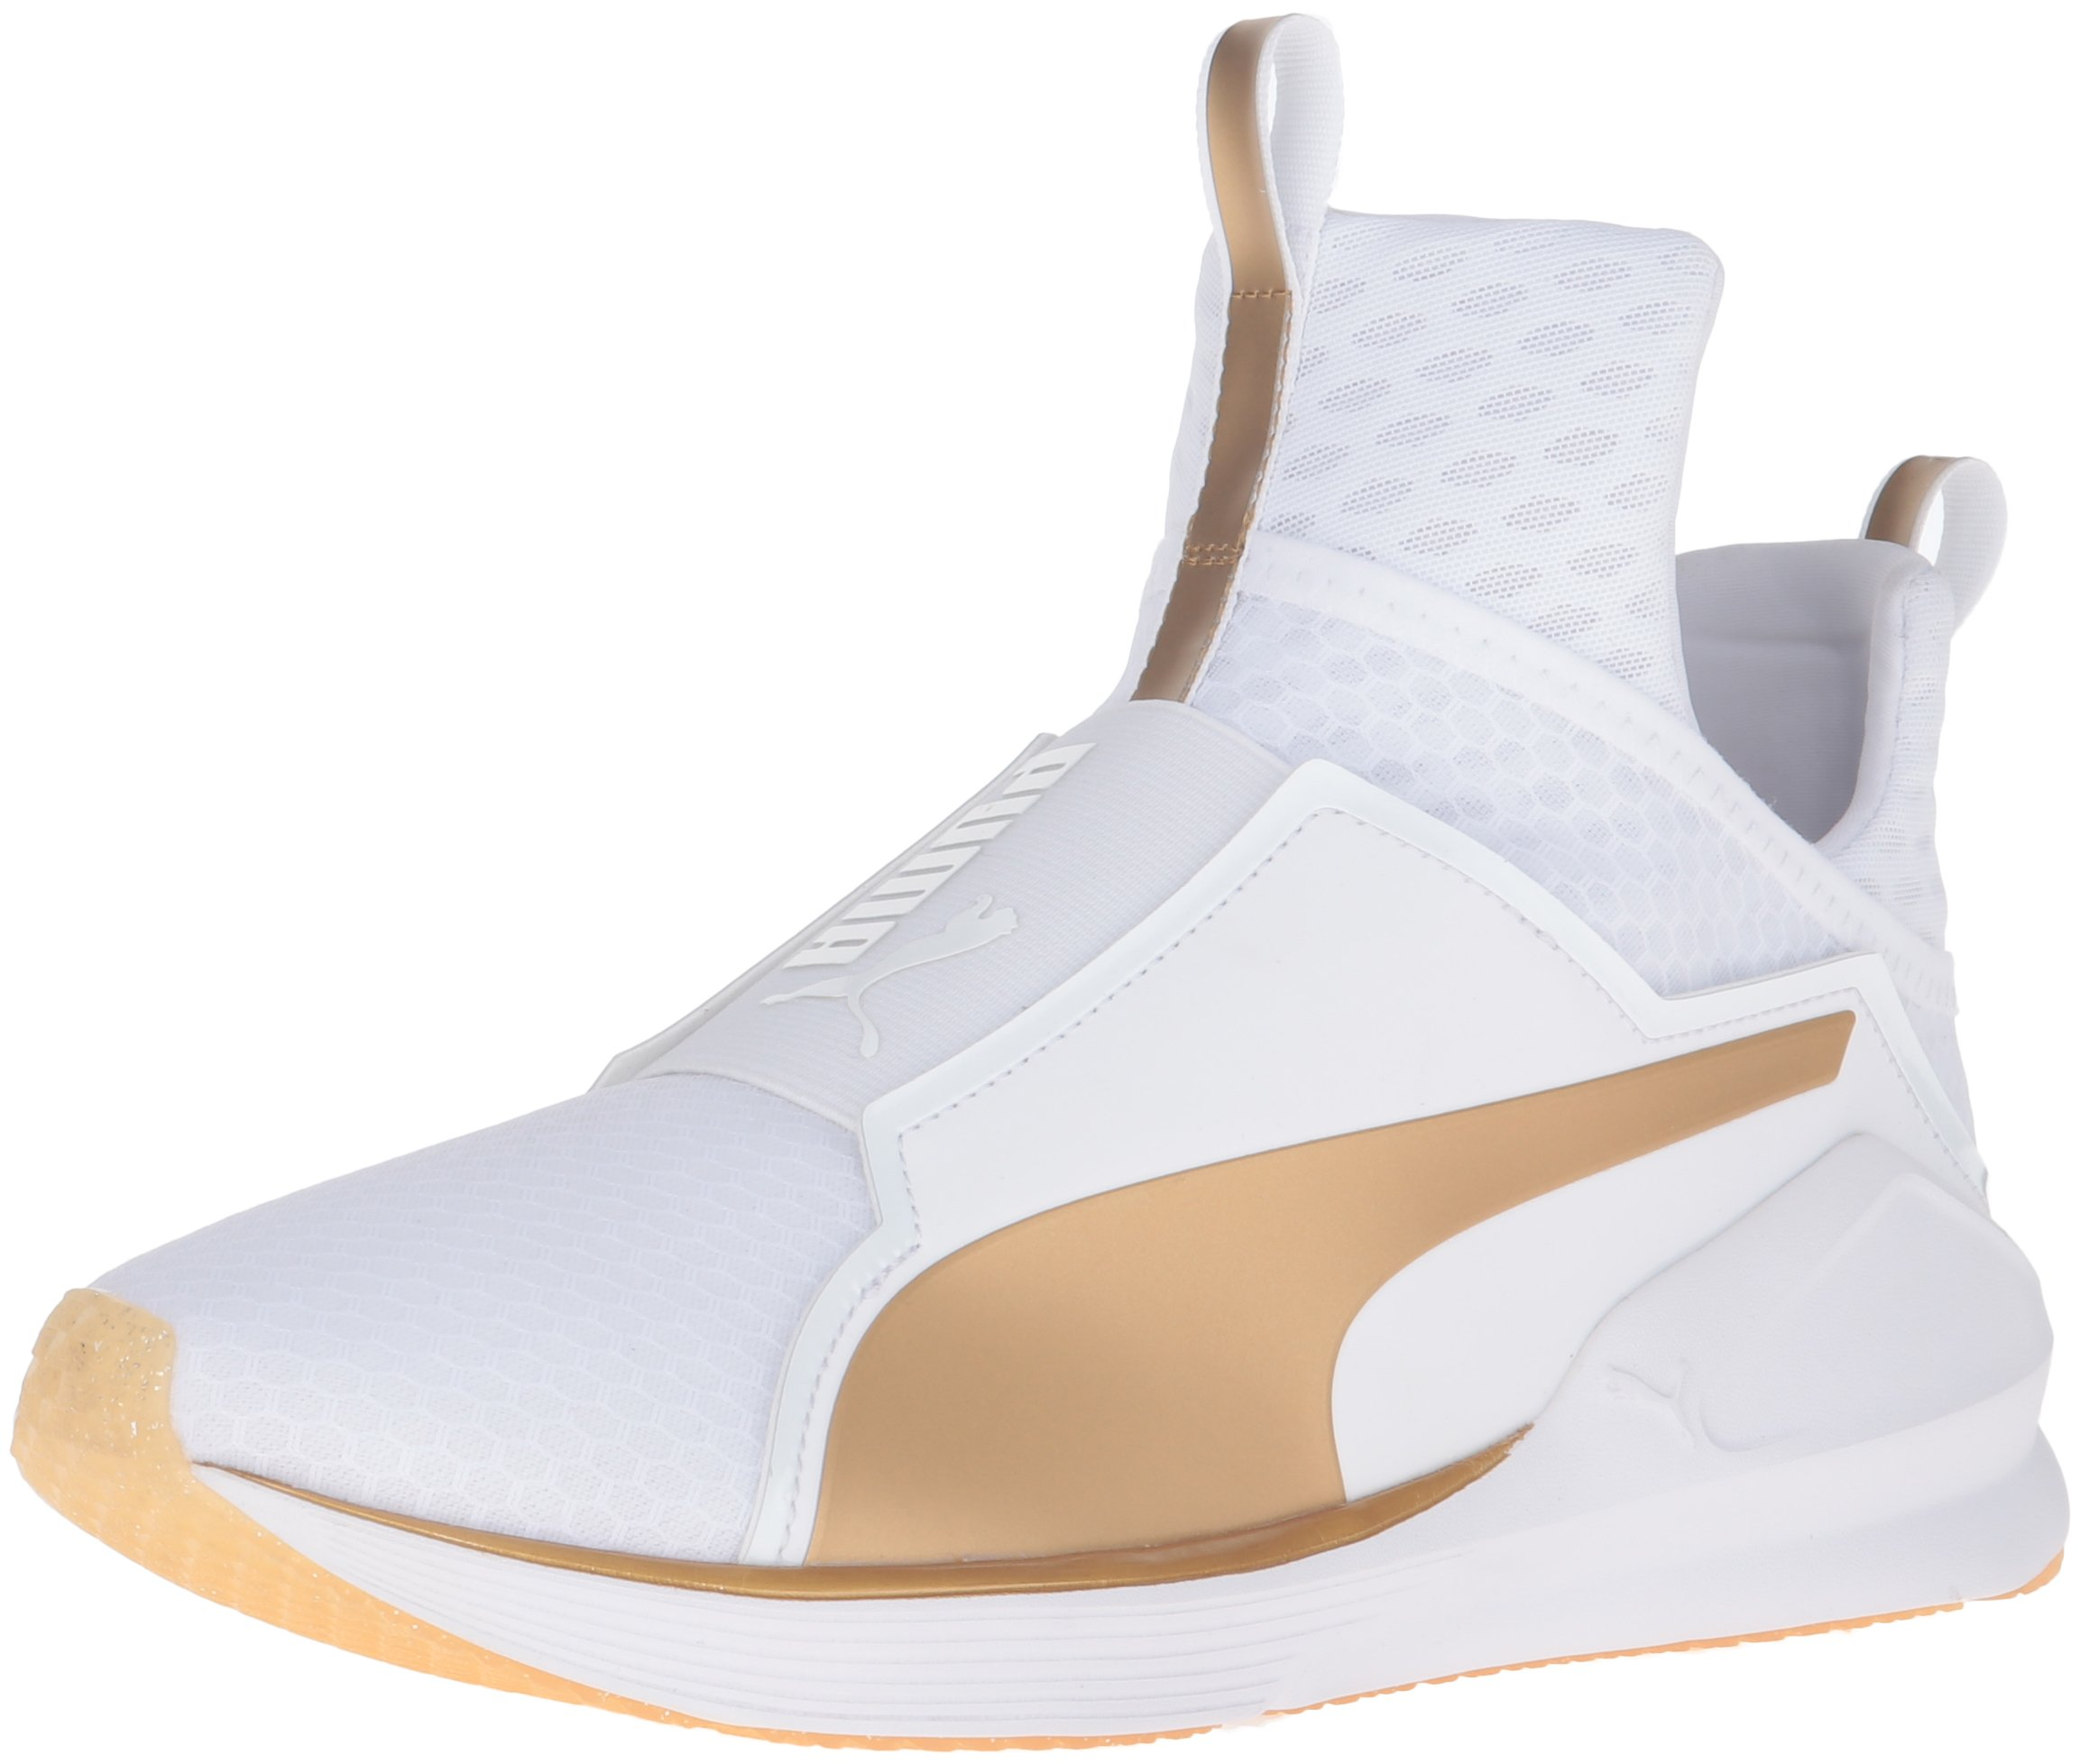 PUMA Women's Fierce Gold Cross-Trainer Shoe, White/Gold, 7 M US